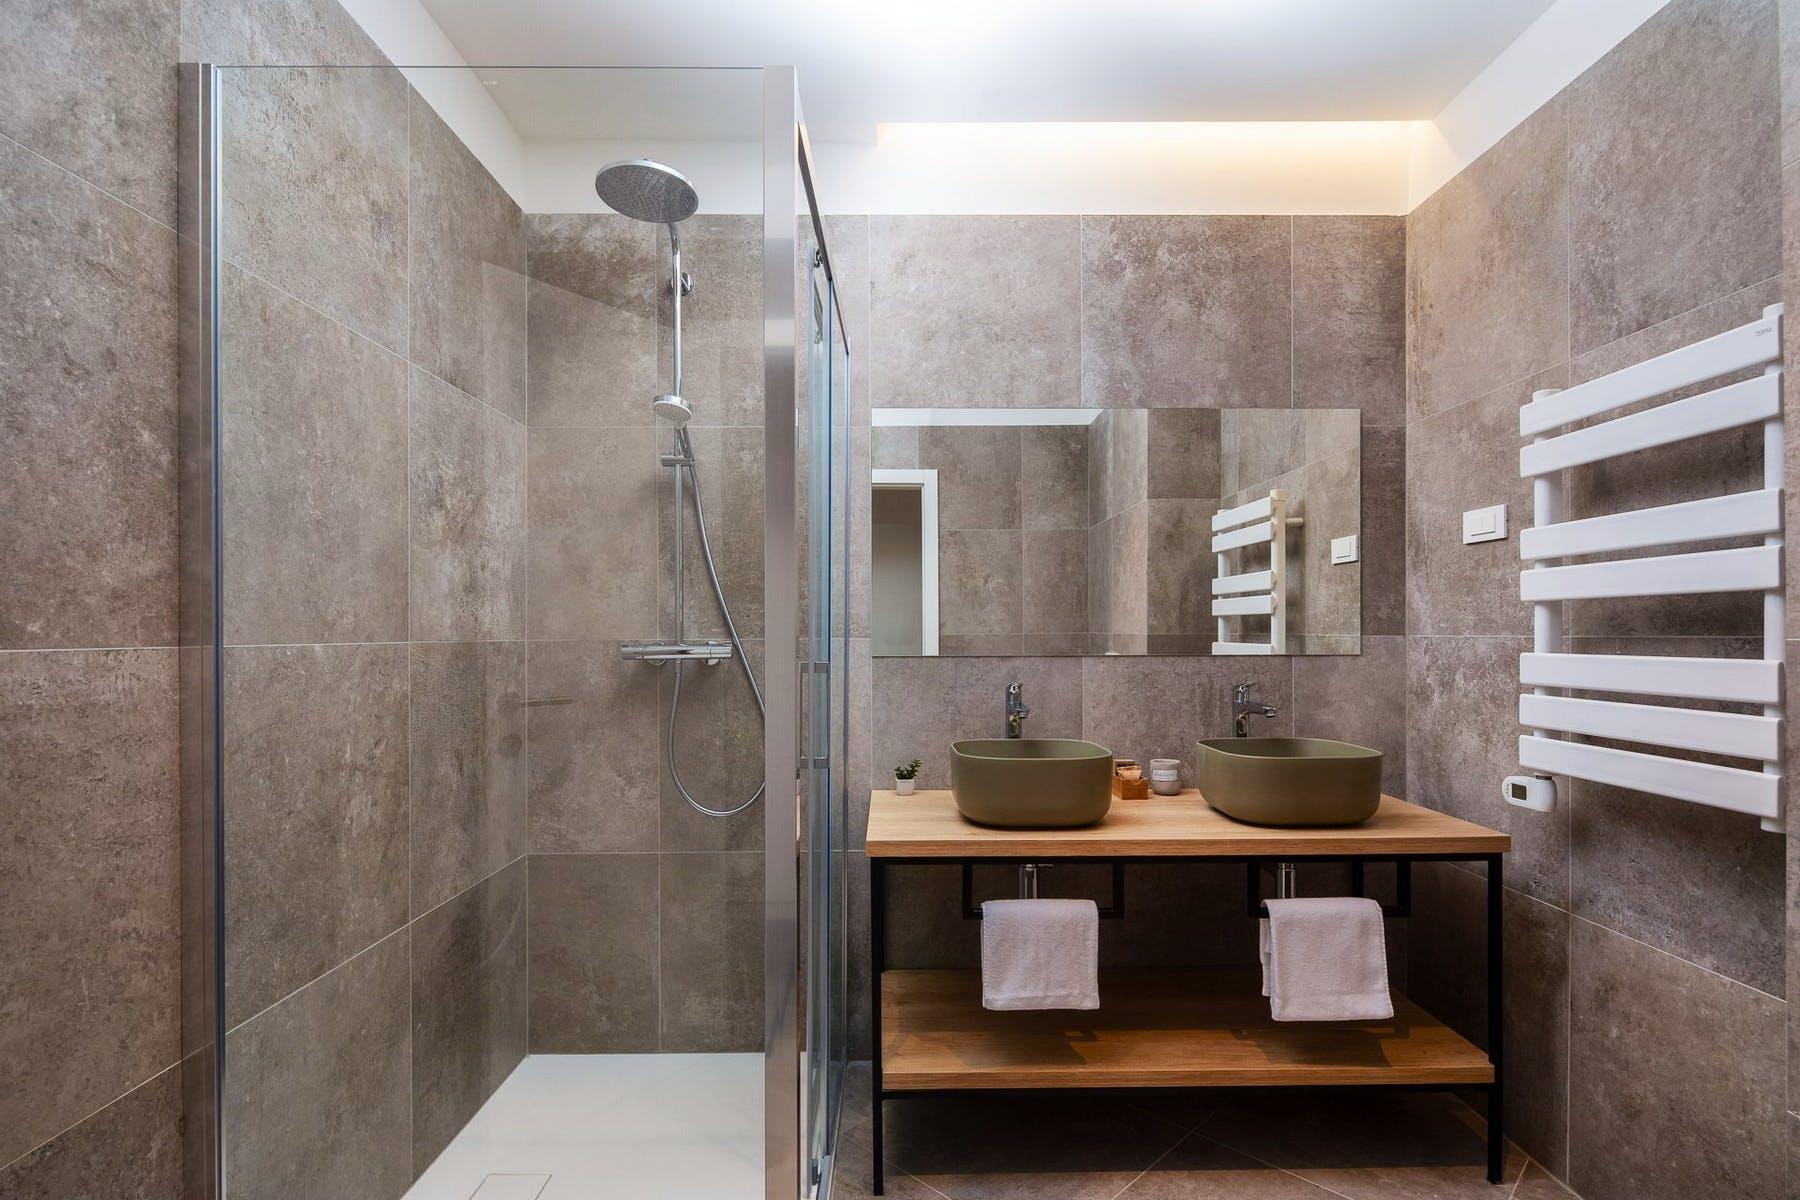 Dvostruki umivaonik